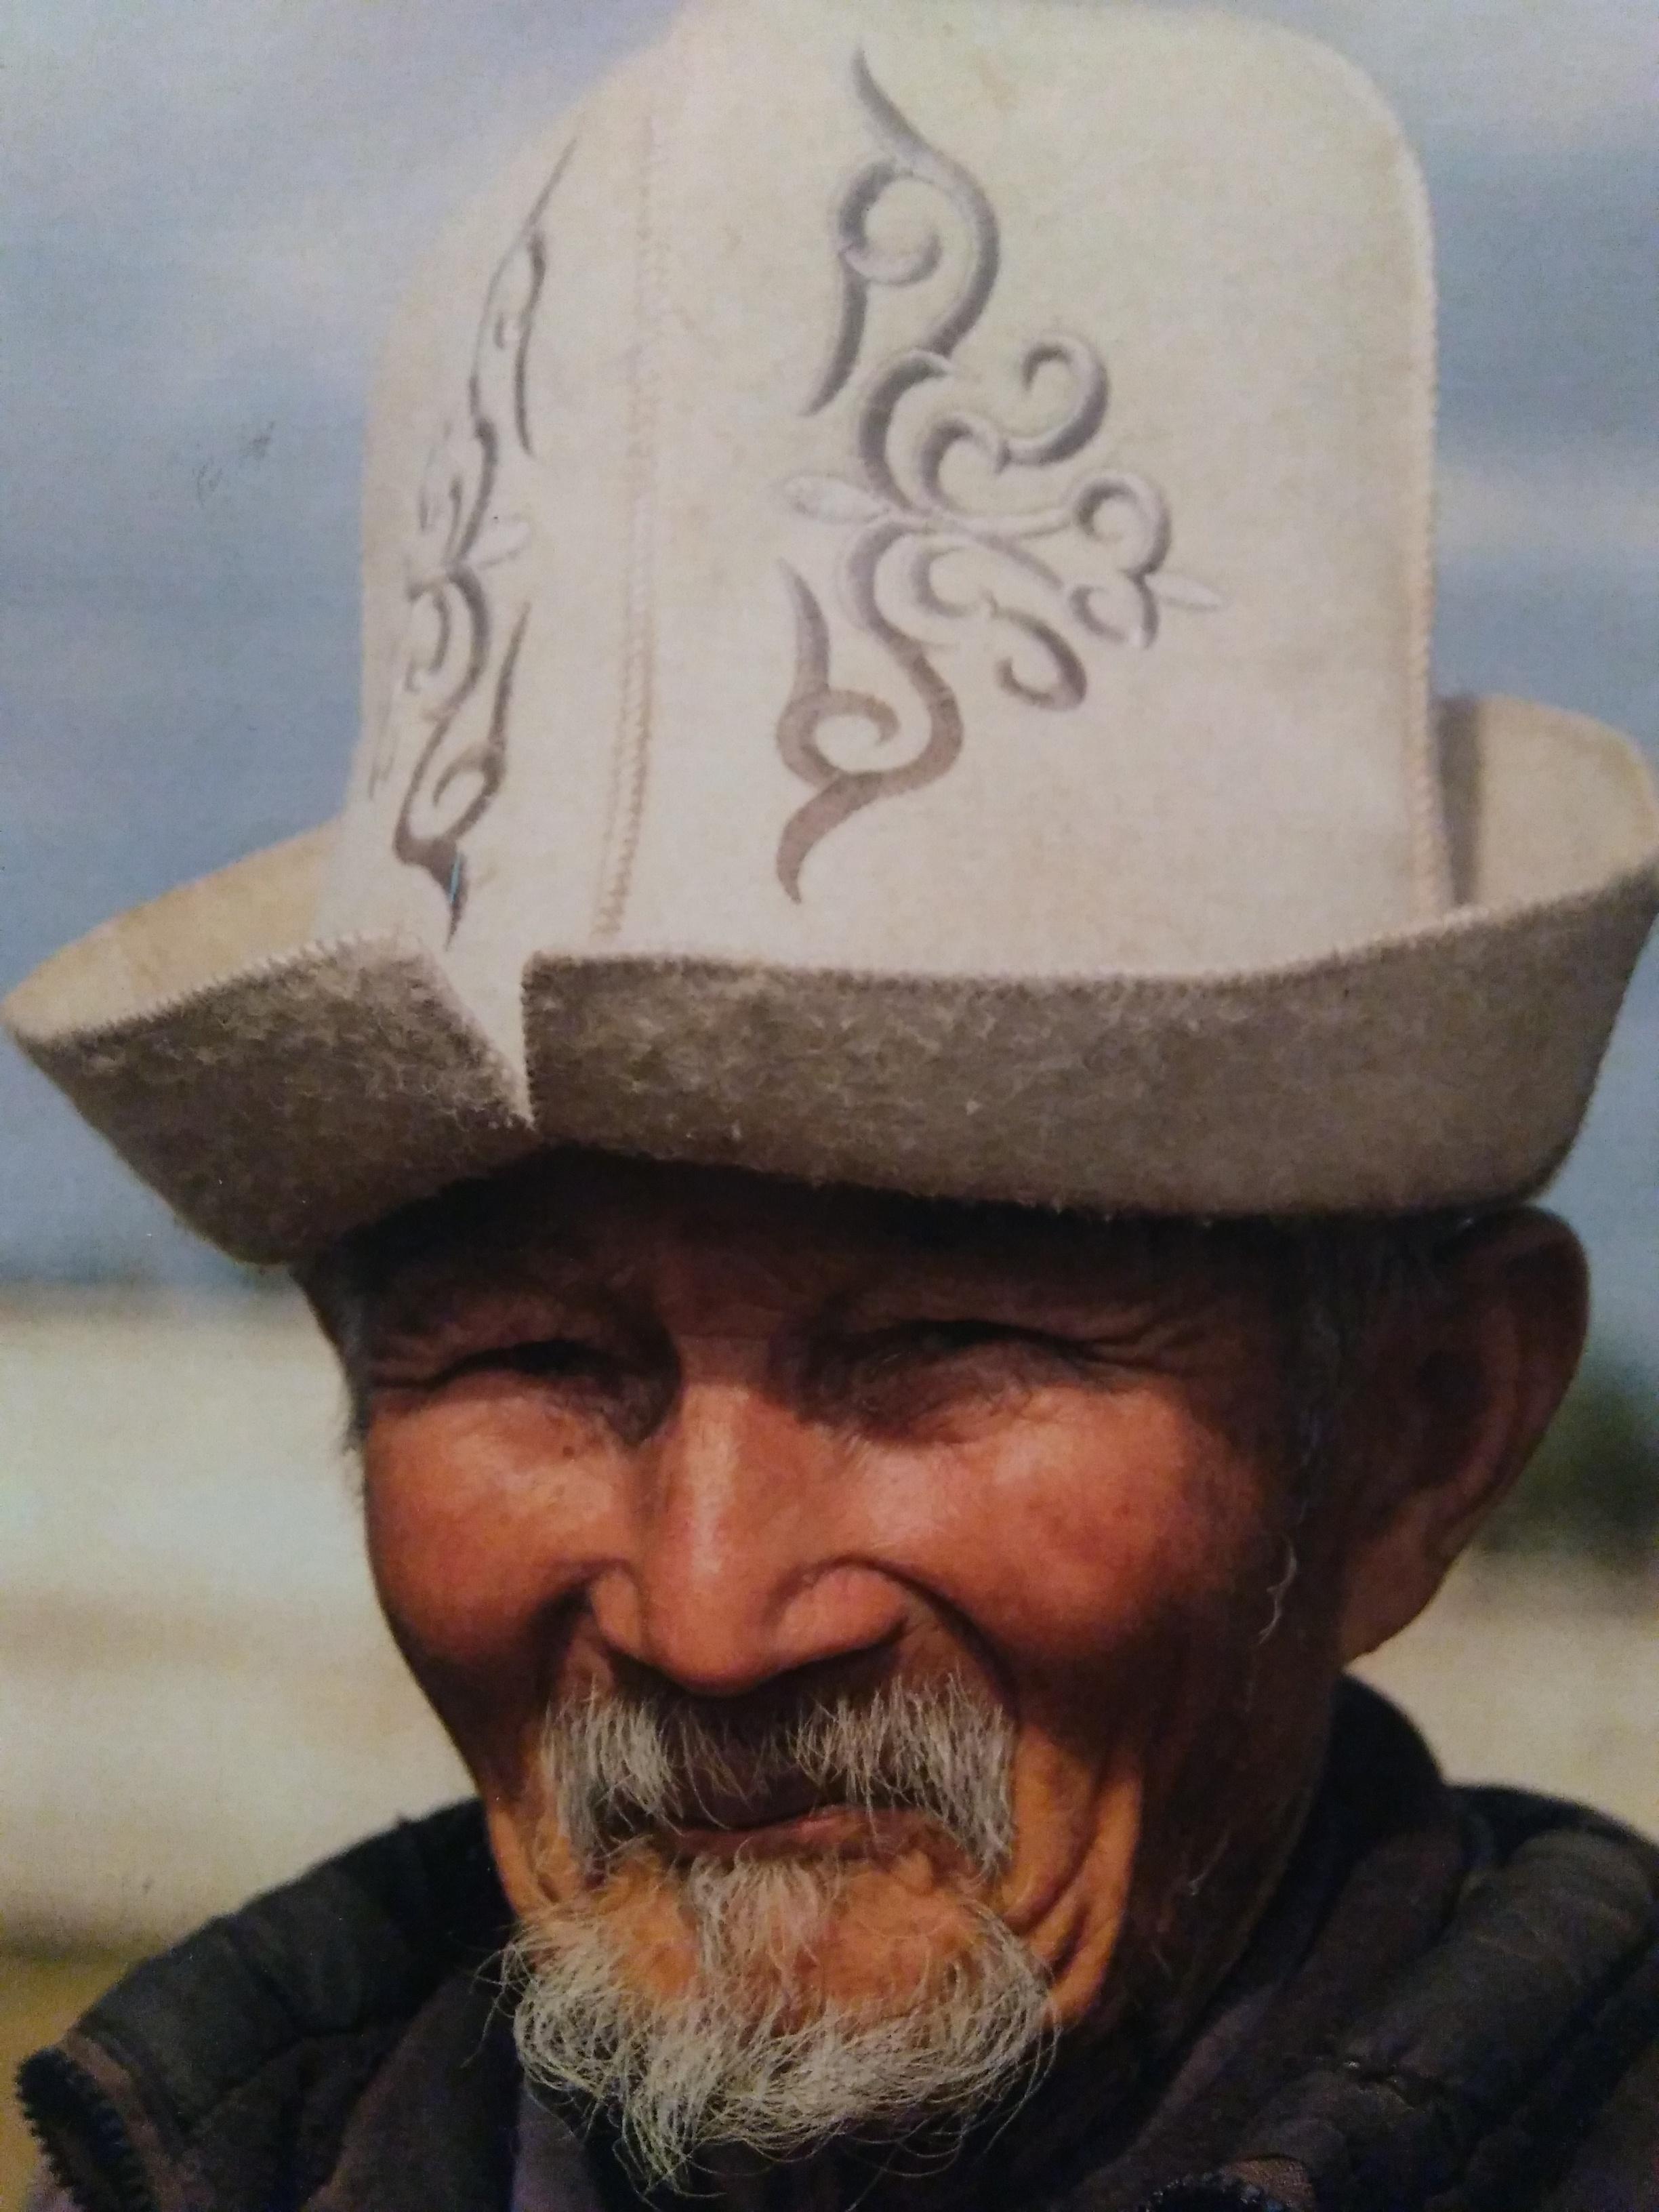 Hat9 Man